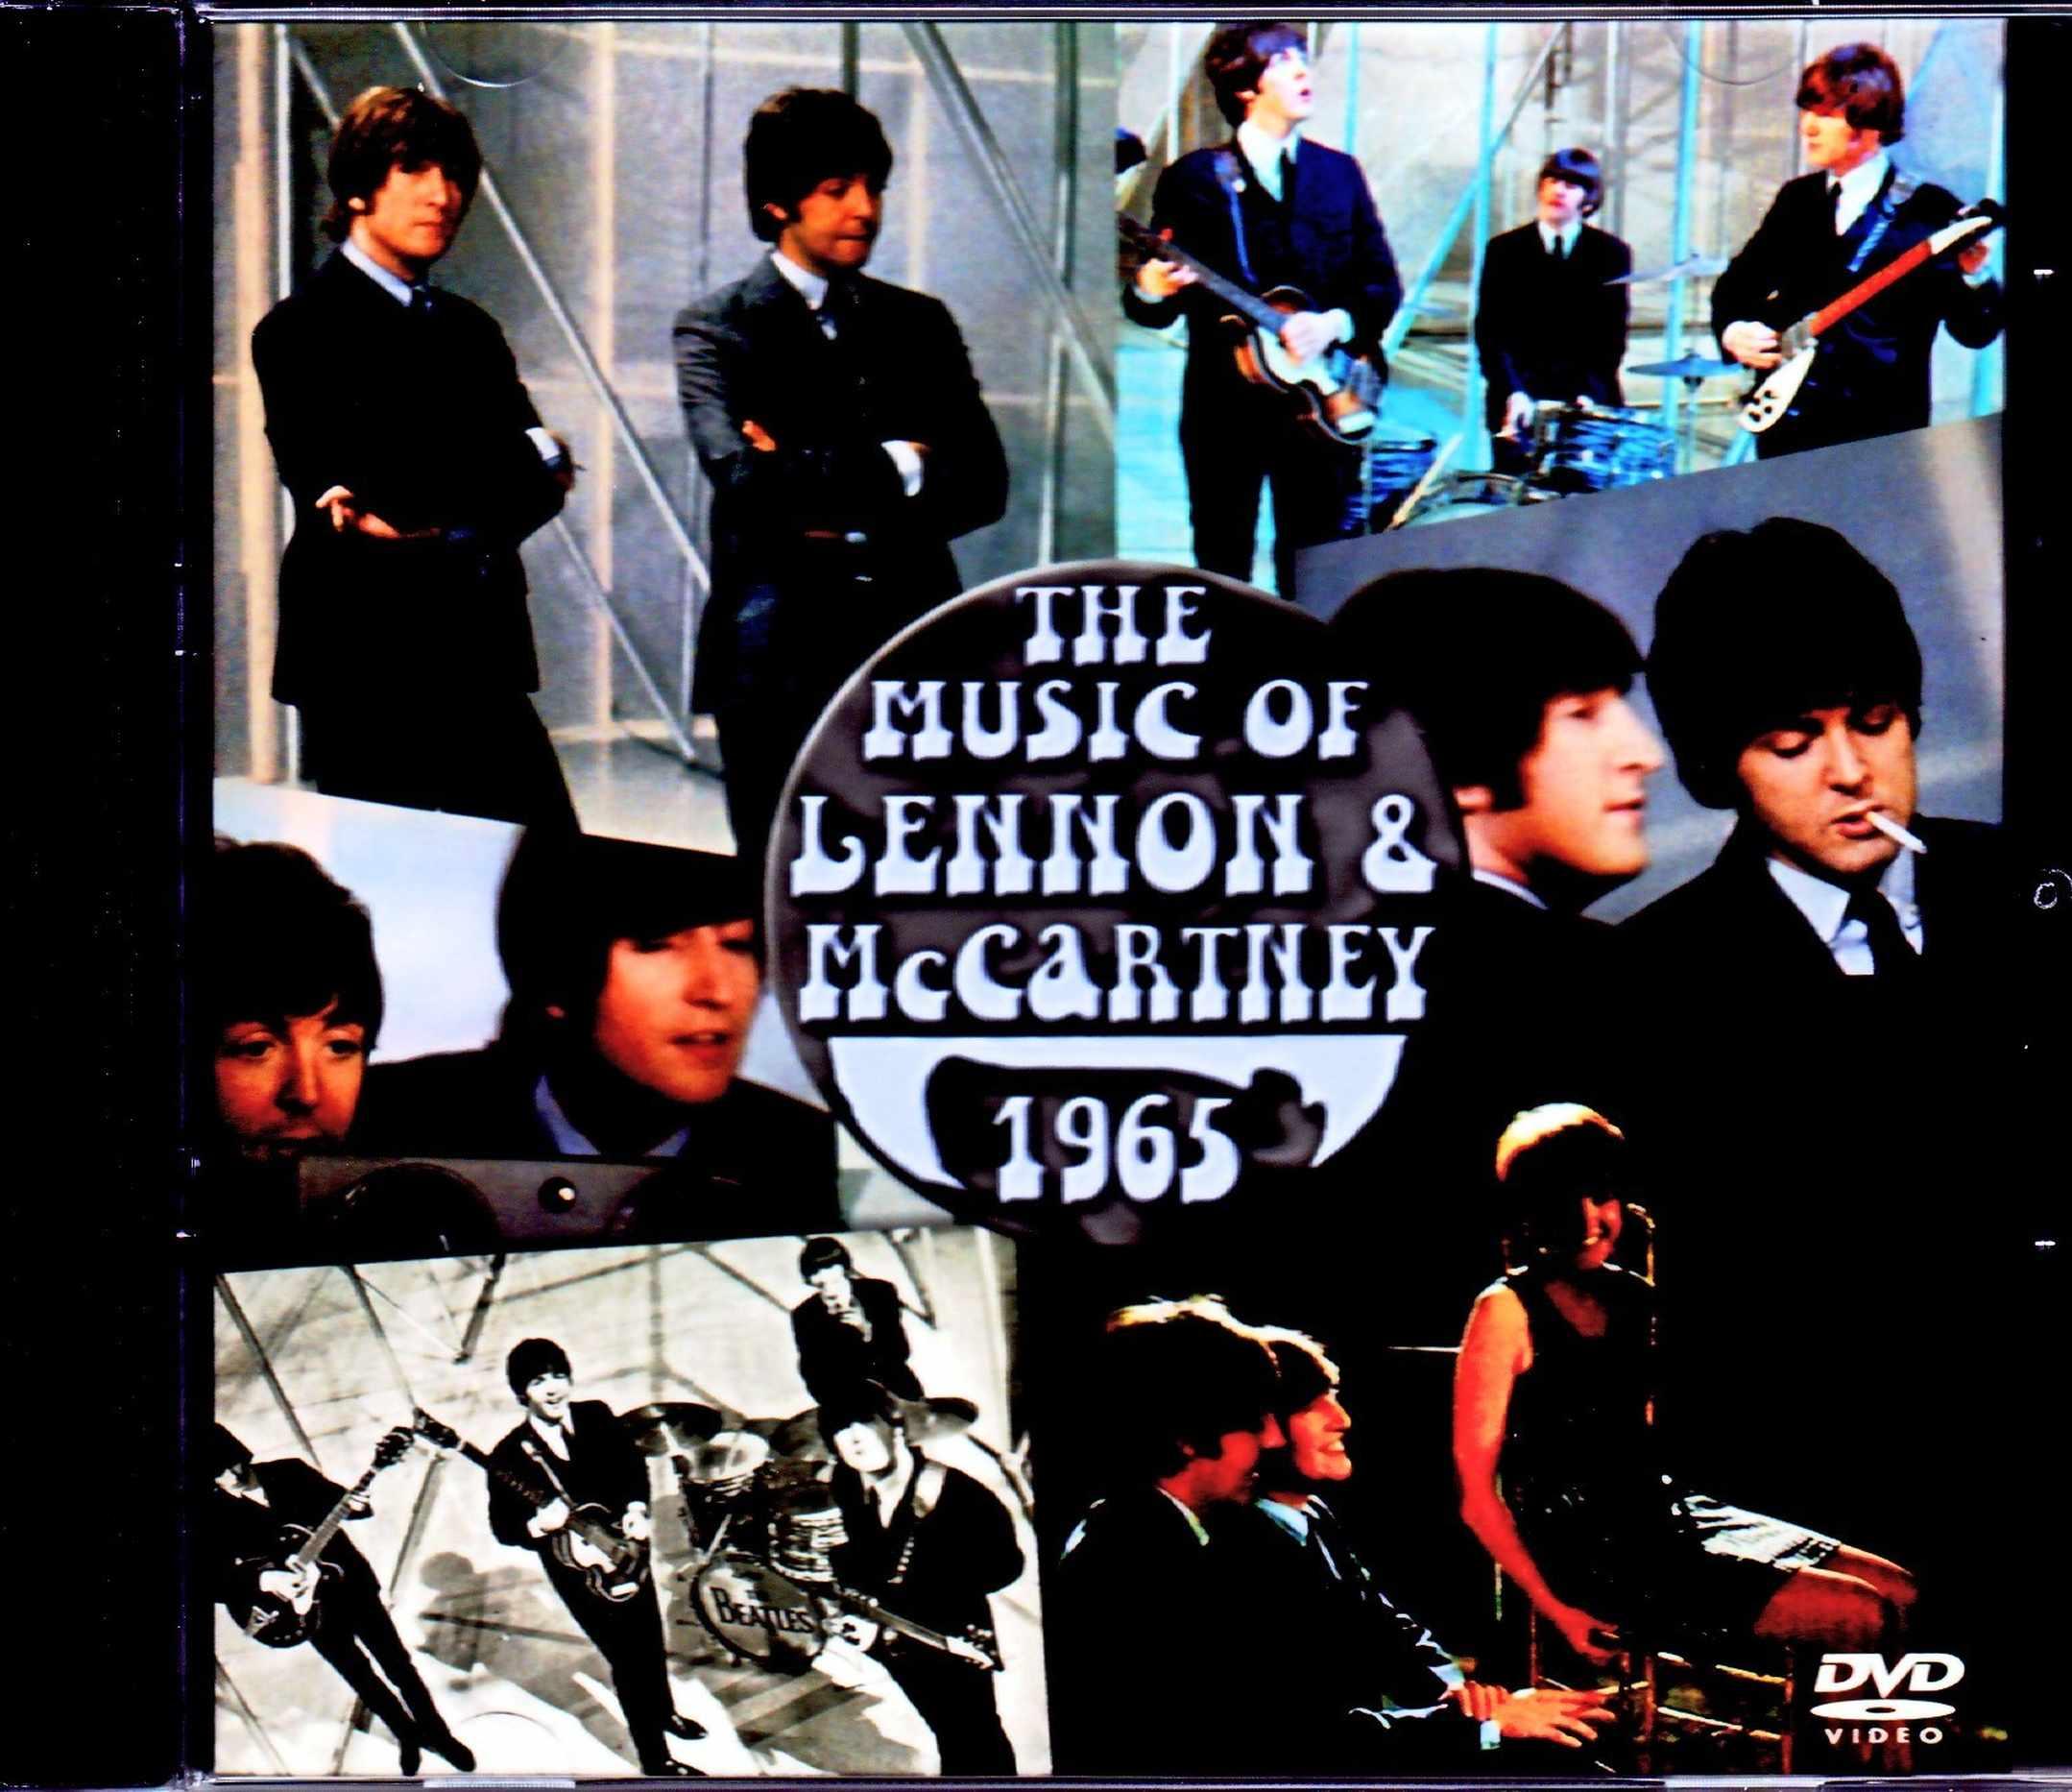 Beatles John Lennon,Paul McCartney ビートルズ ジョン・レノン ポール・マッカートニー/グラナダ・テレビ特別プログラム 完全版